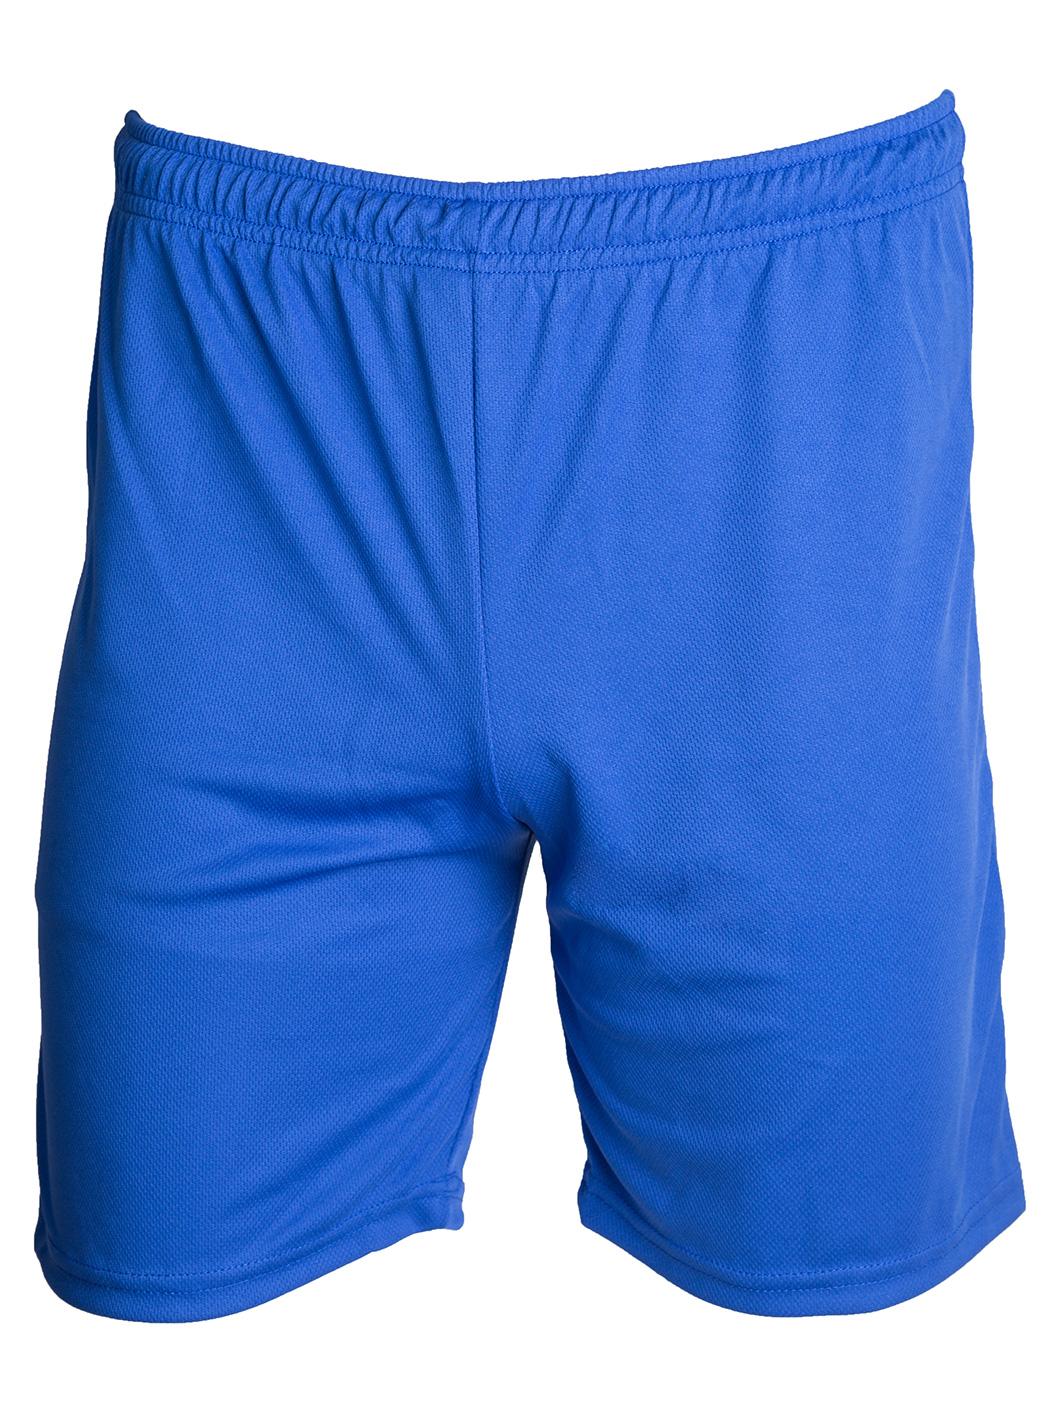 muški šorc plavi